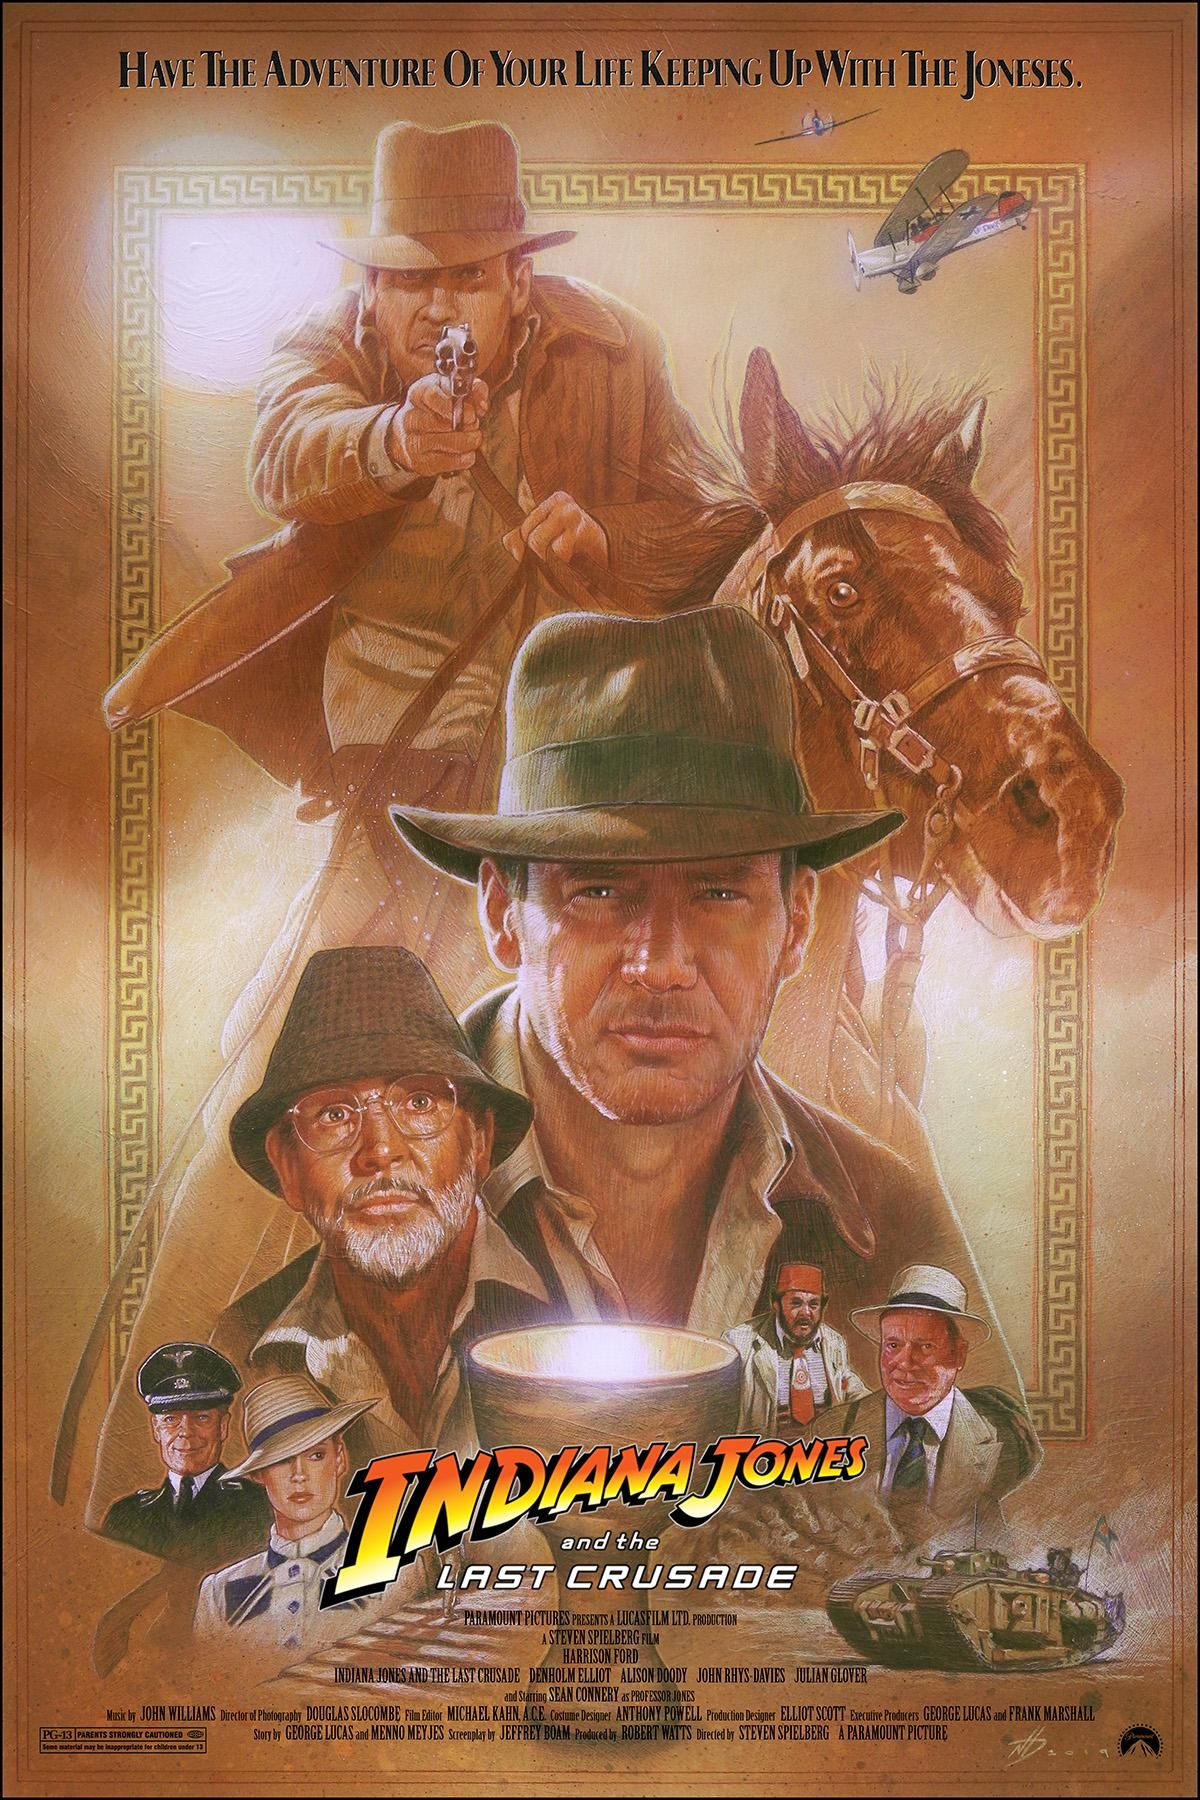 Indiana Jones and the Last Crusade (1989) [1200 x 1800